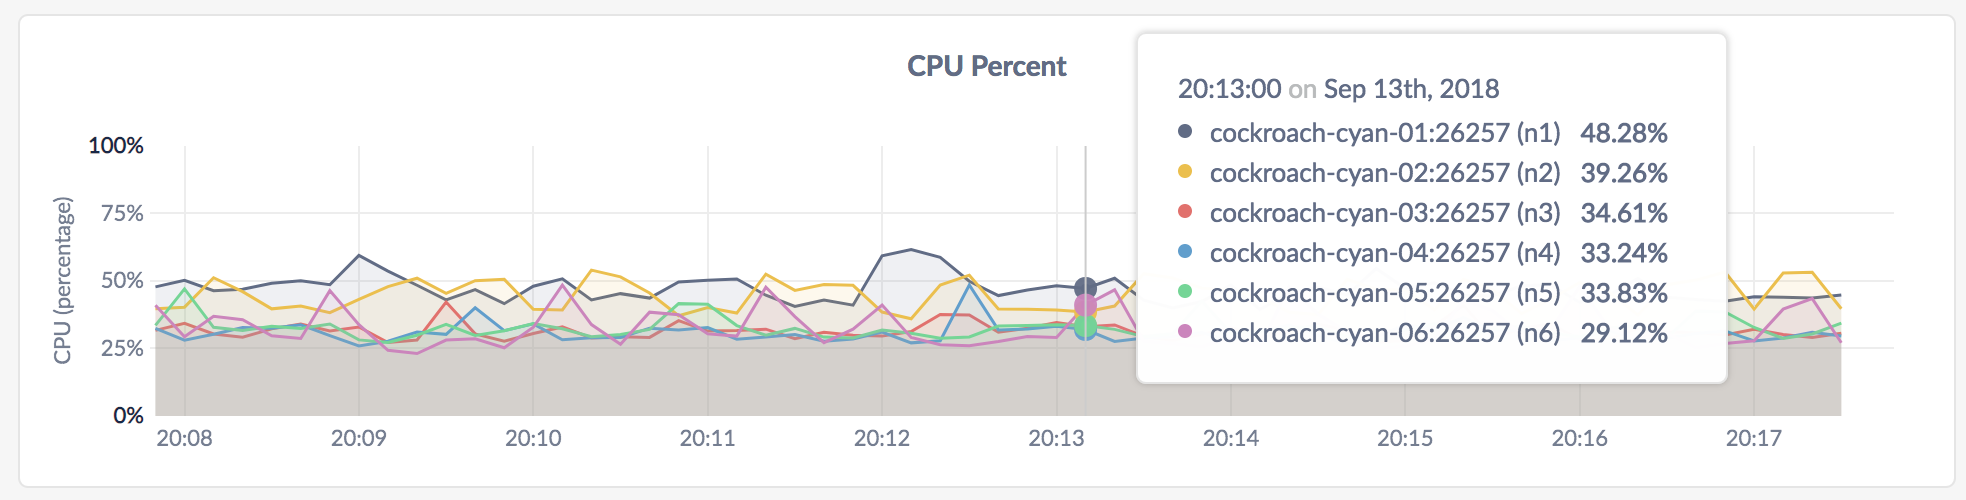 DB Console CPU Percent graph